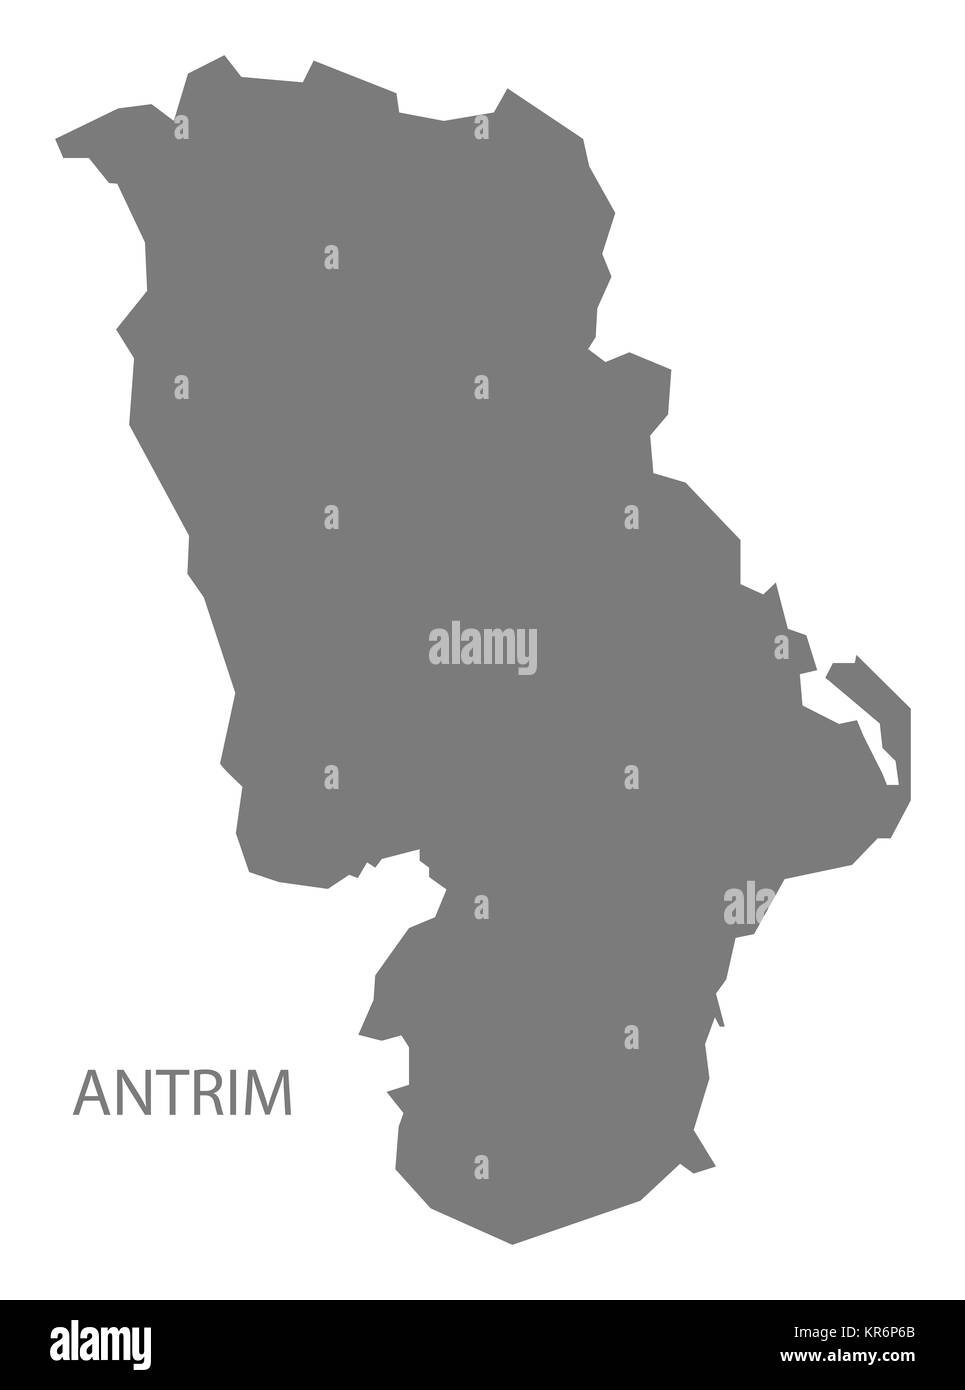 Antrim Northern Ireland Map grey - Stock Image